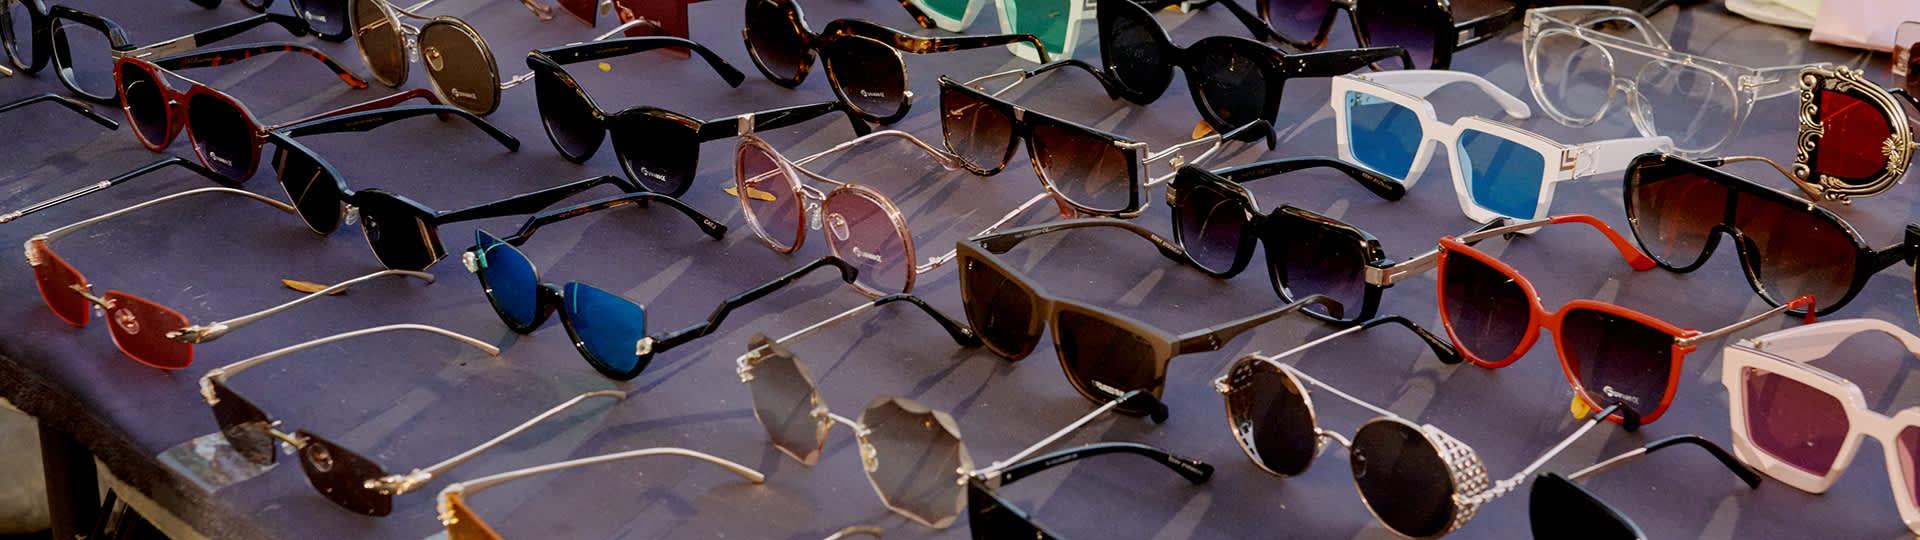 Sunglasses, 125th Street, Harlem, Manhattan, NYC